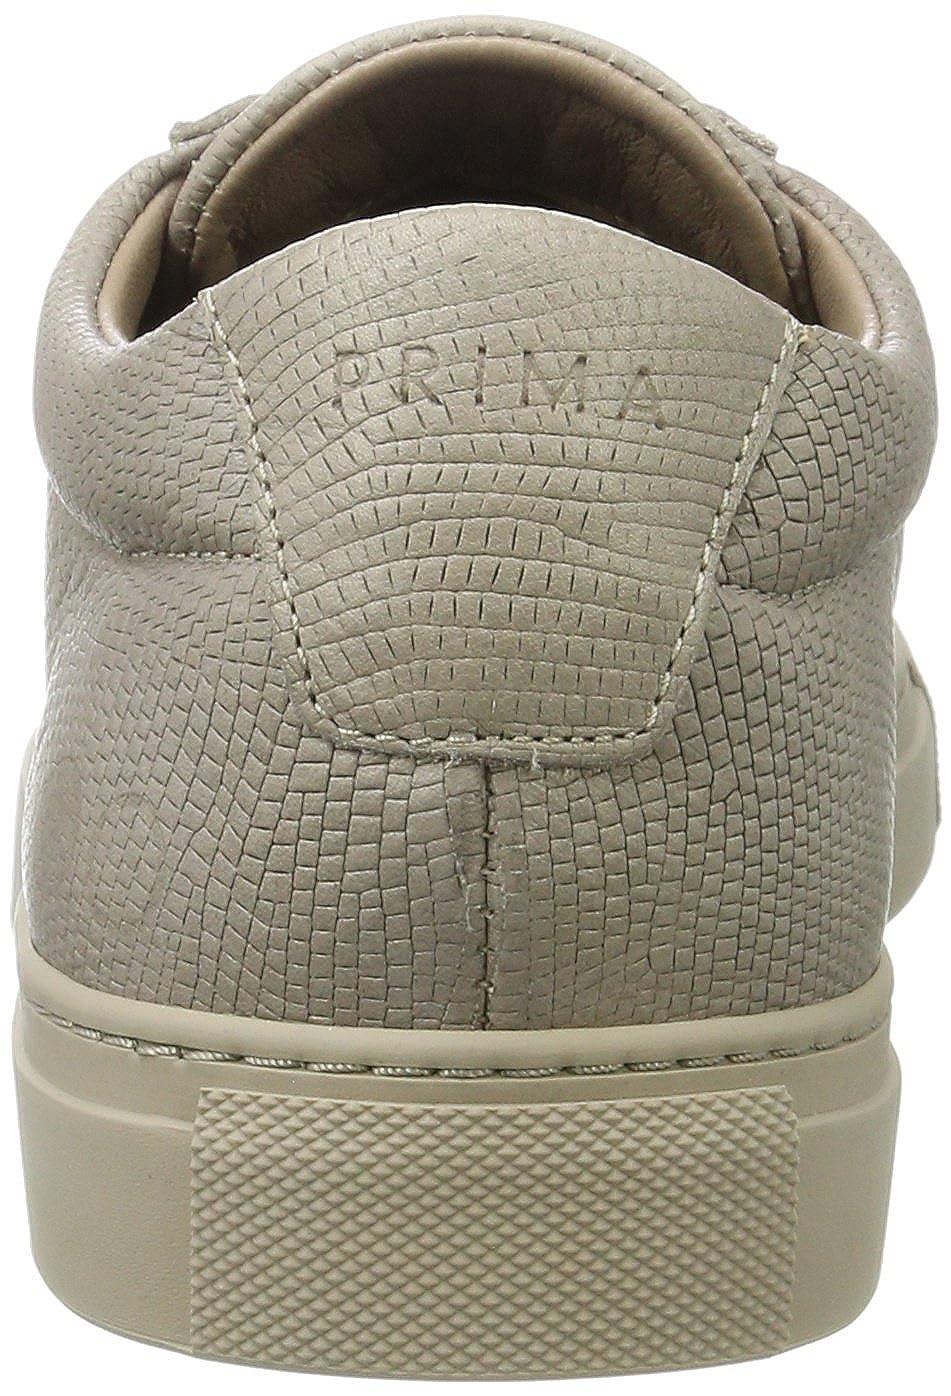 Prima Beige Forma Unisex-Erwachsene Primaforma Sneaker Beige Prima (Malt) 74a20a